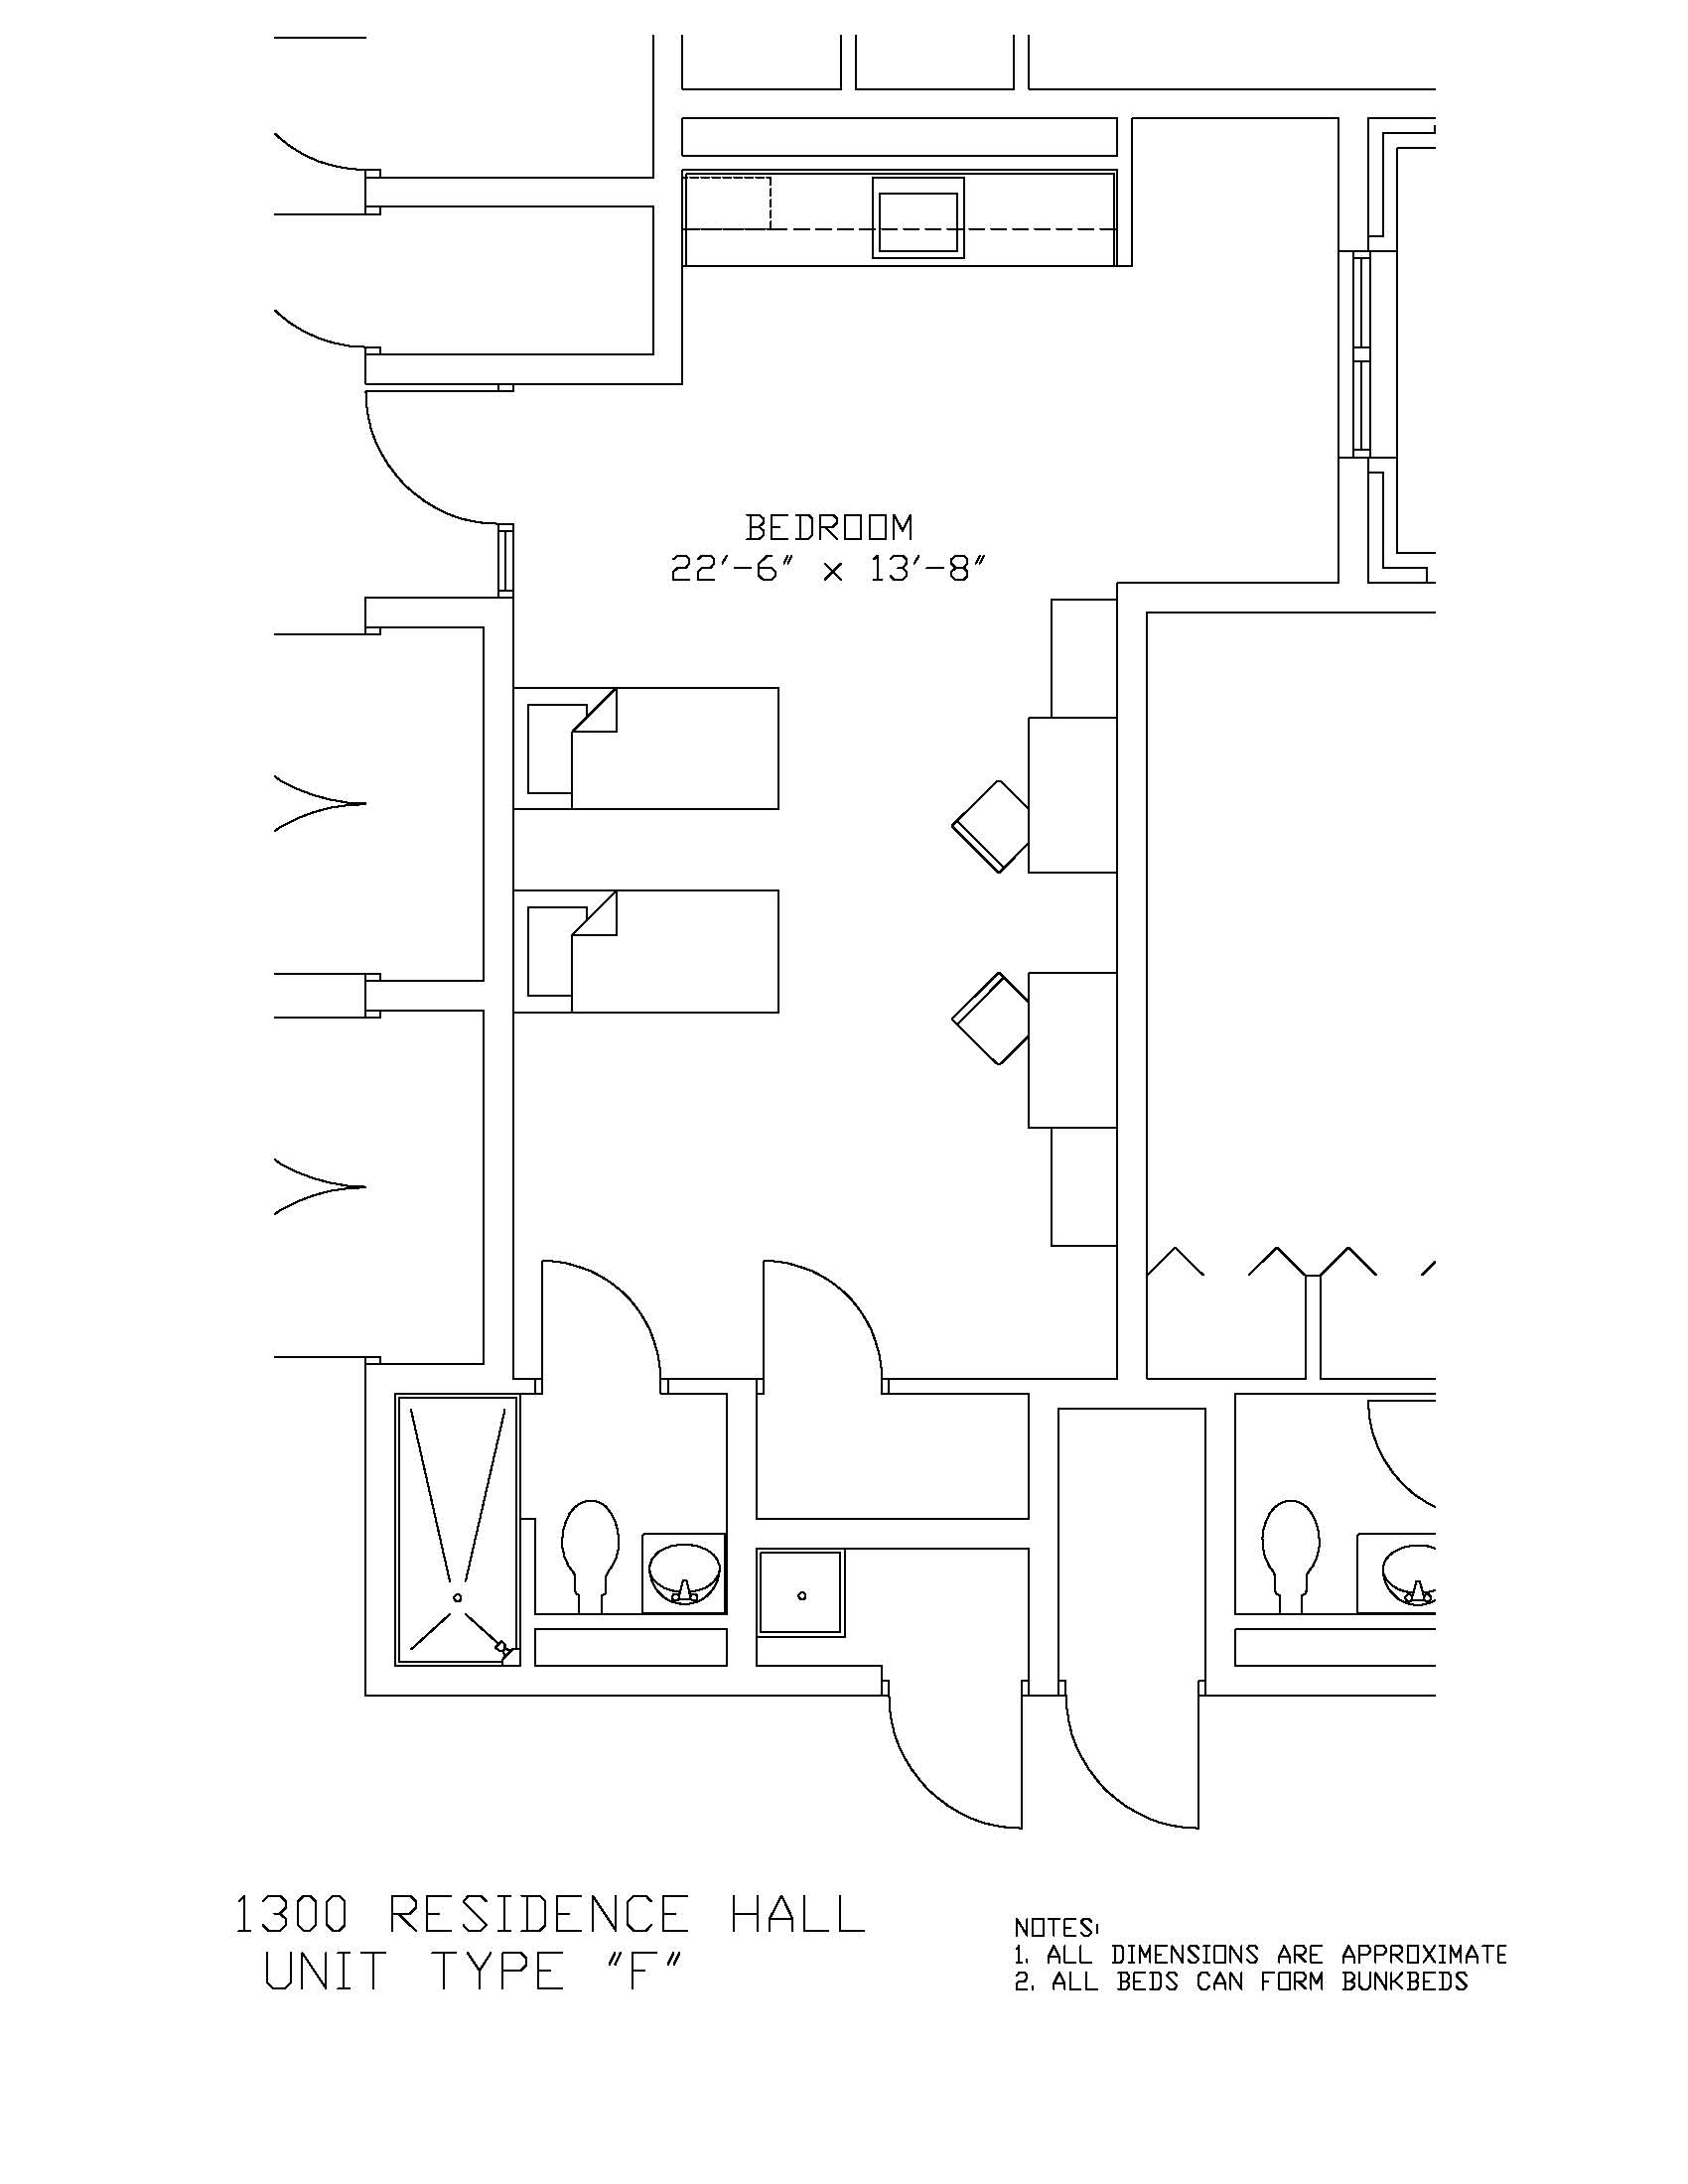 1300 Residence Hall: Type F